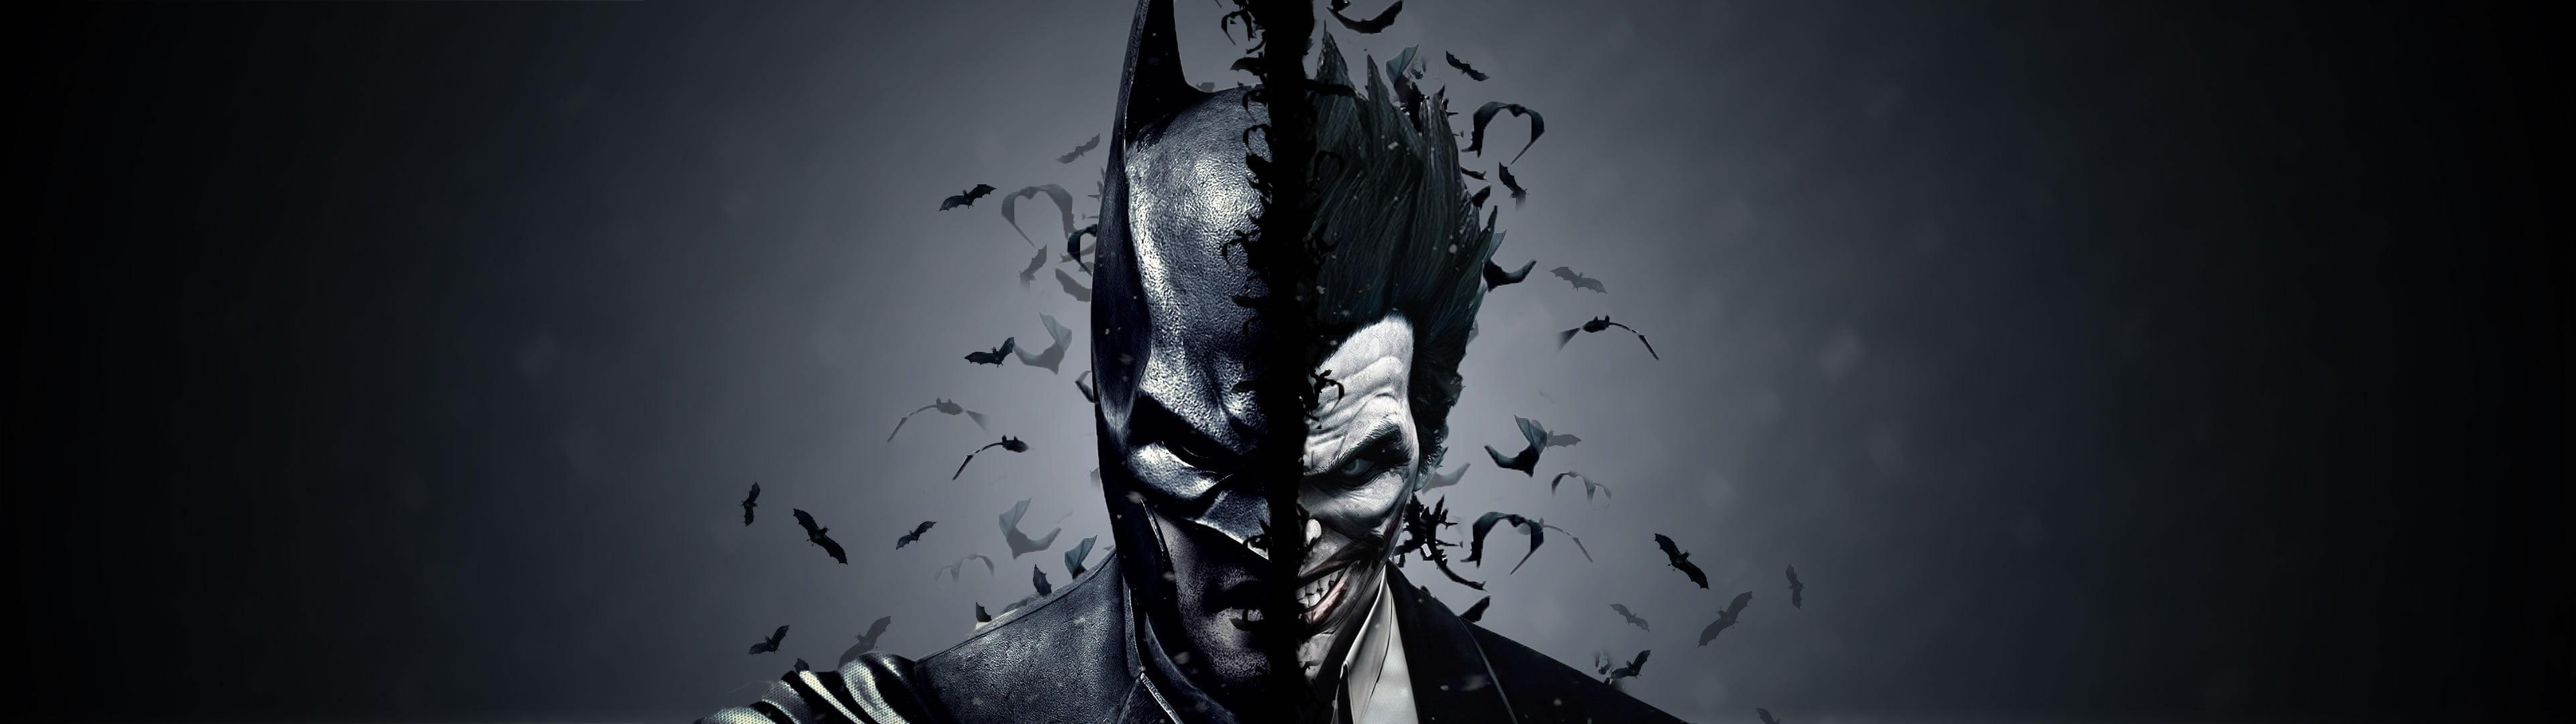 besplatne pozadine za dva monitora batman & joker